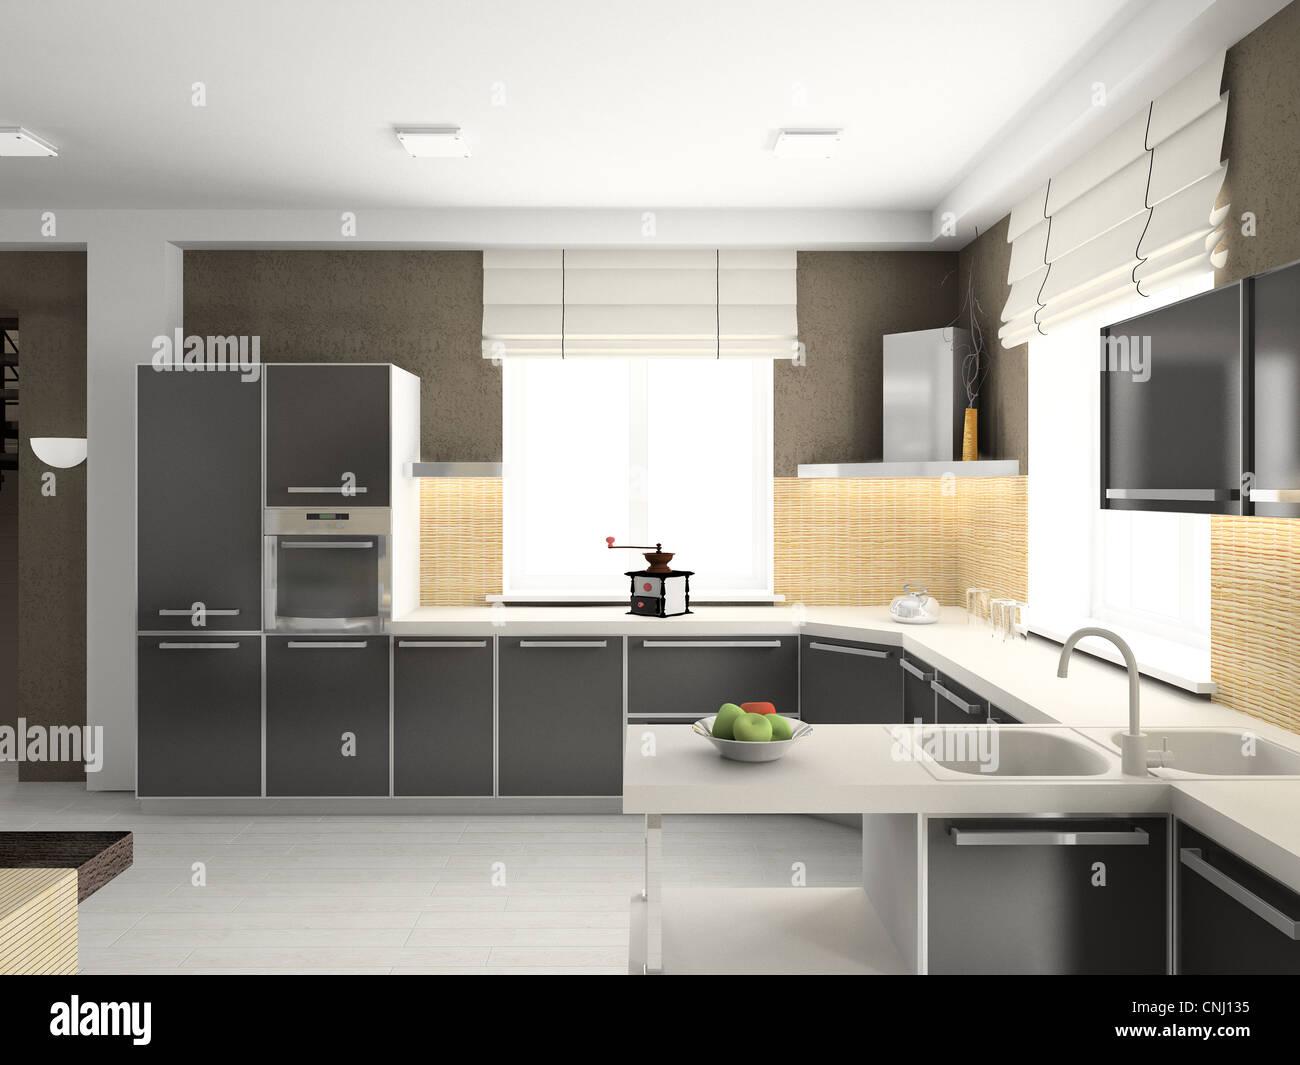 Moderno diseño interior de cocina. 3D Render Foto & Imagen De Stock ...